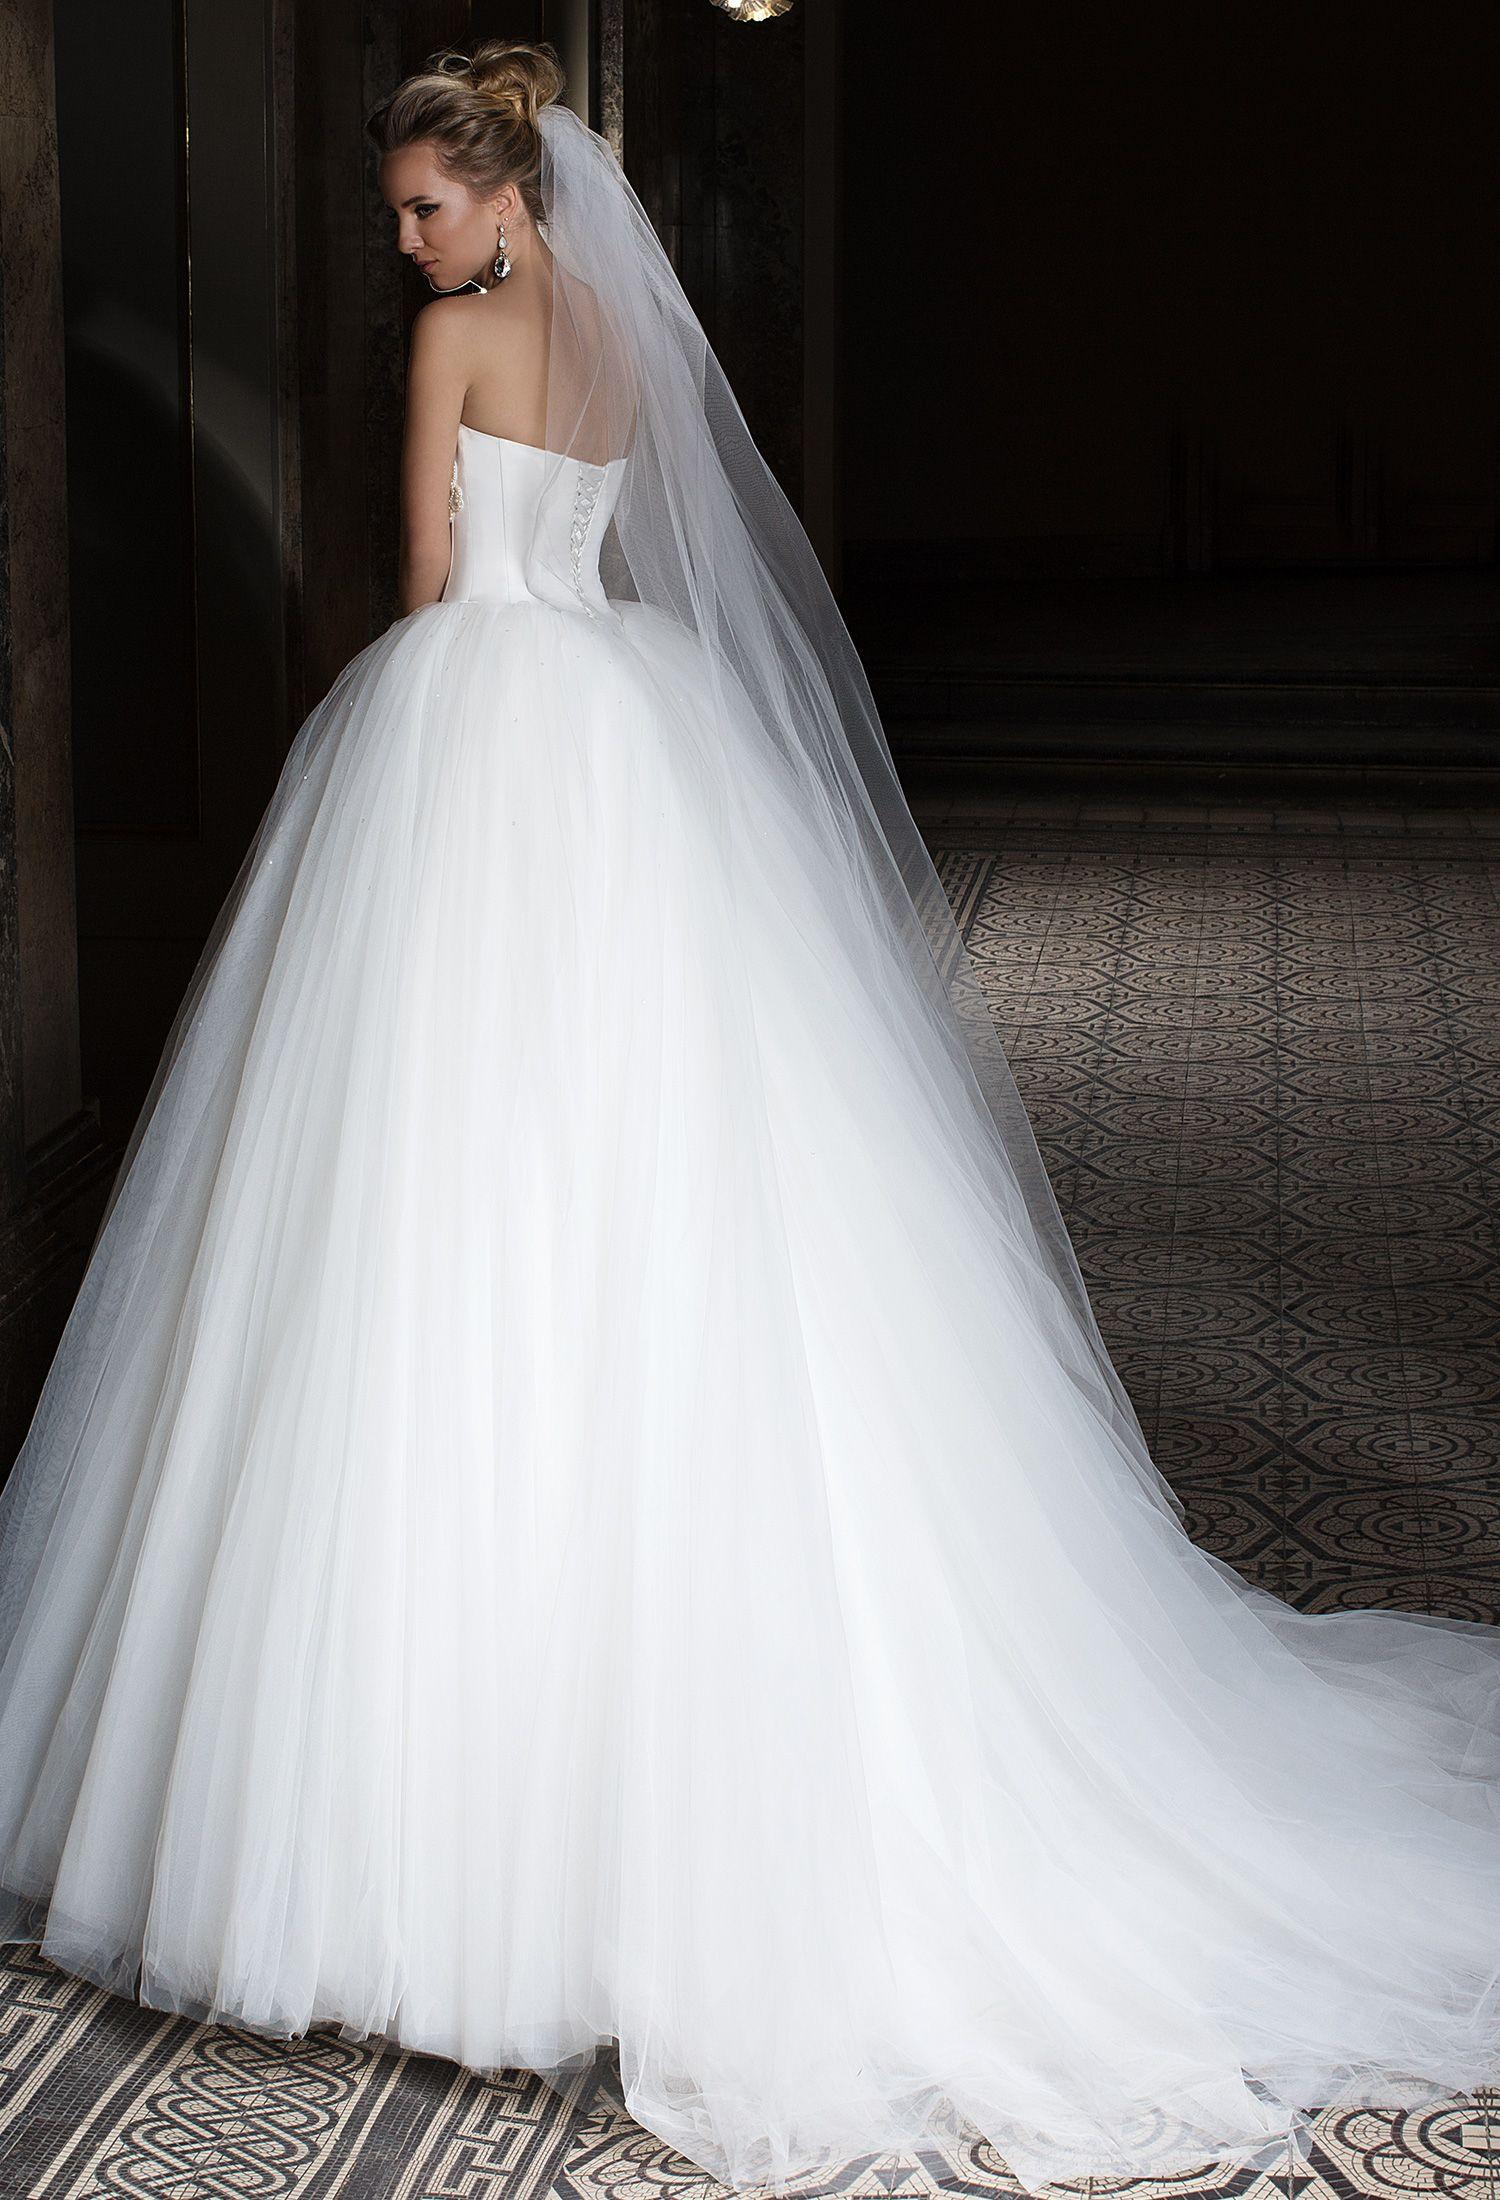 N and touko wedding - Bernadette Oksana Mukha 2016 Marriage